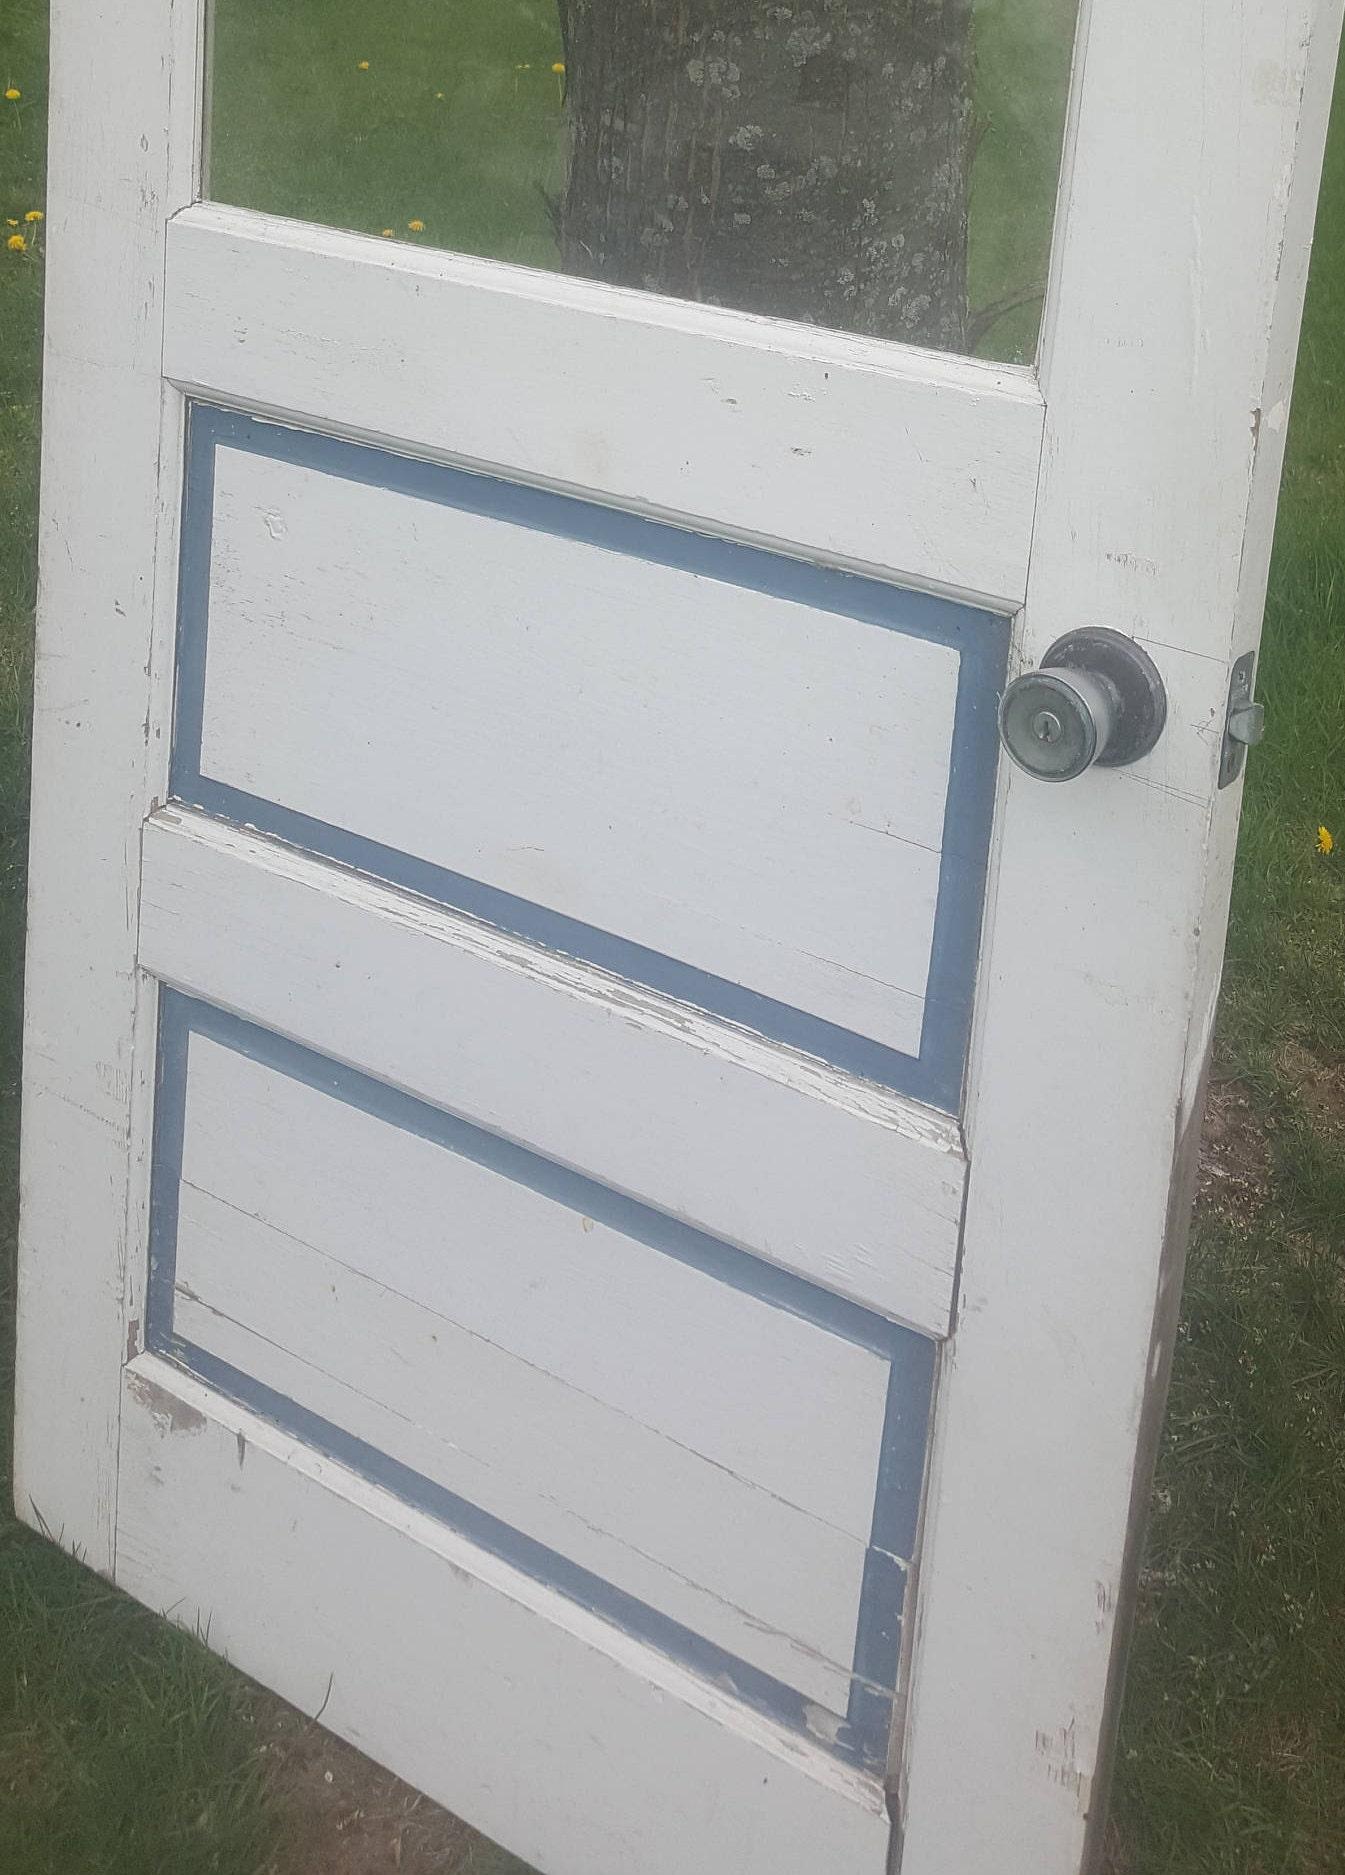 Old Wood Door W3 Pane Window 32 X 77 Architectural Salvaged